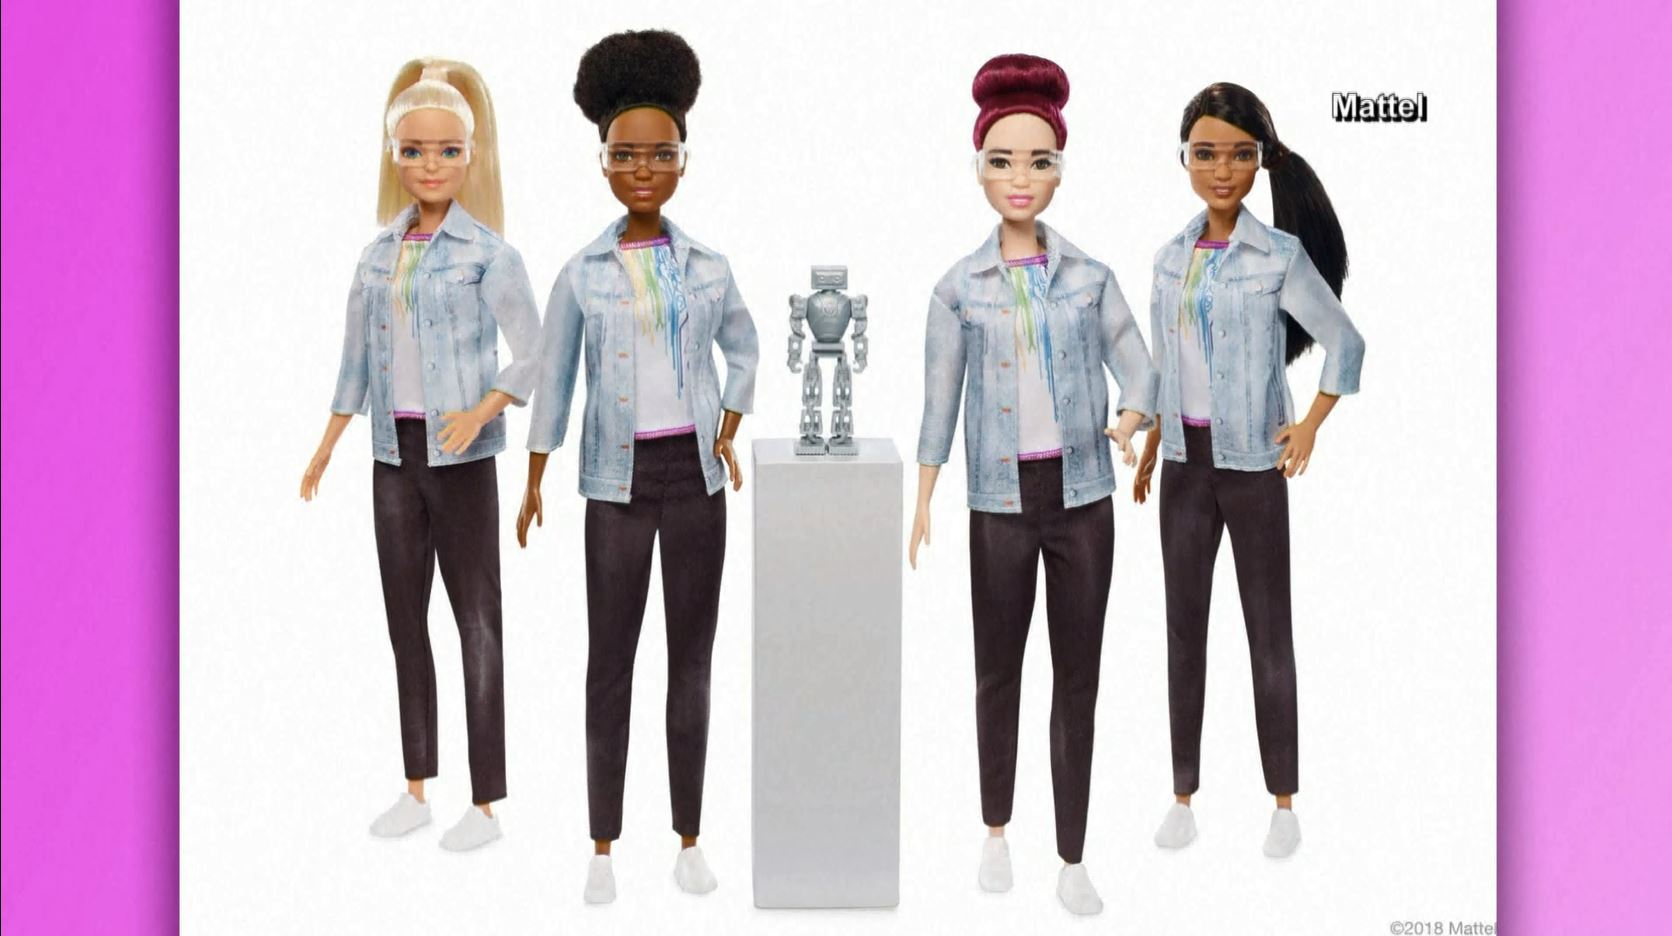 robotics engineer barbie_1530035804161.JPG.jpg